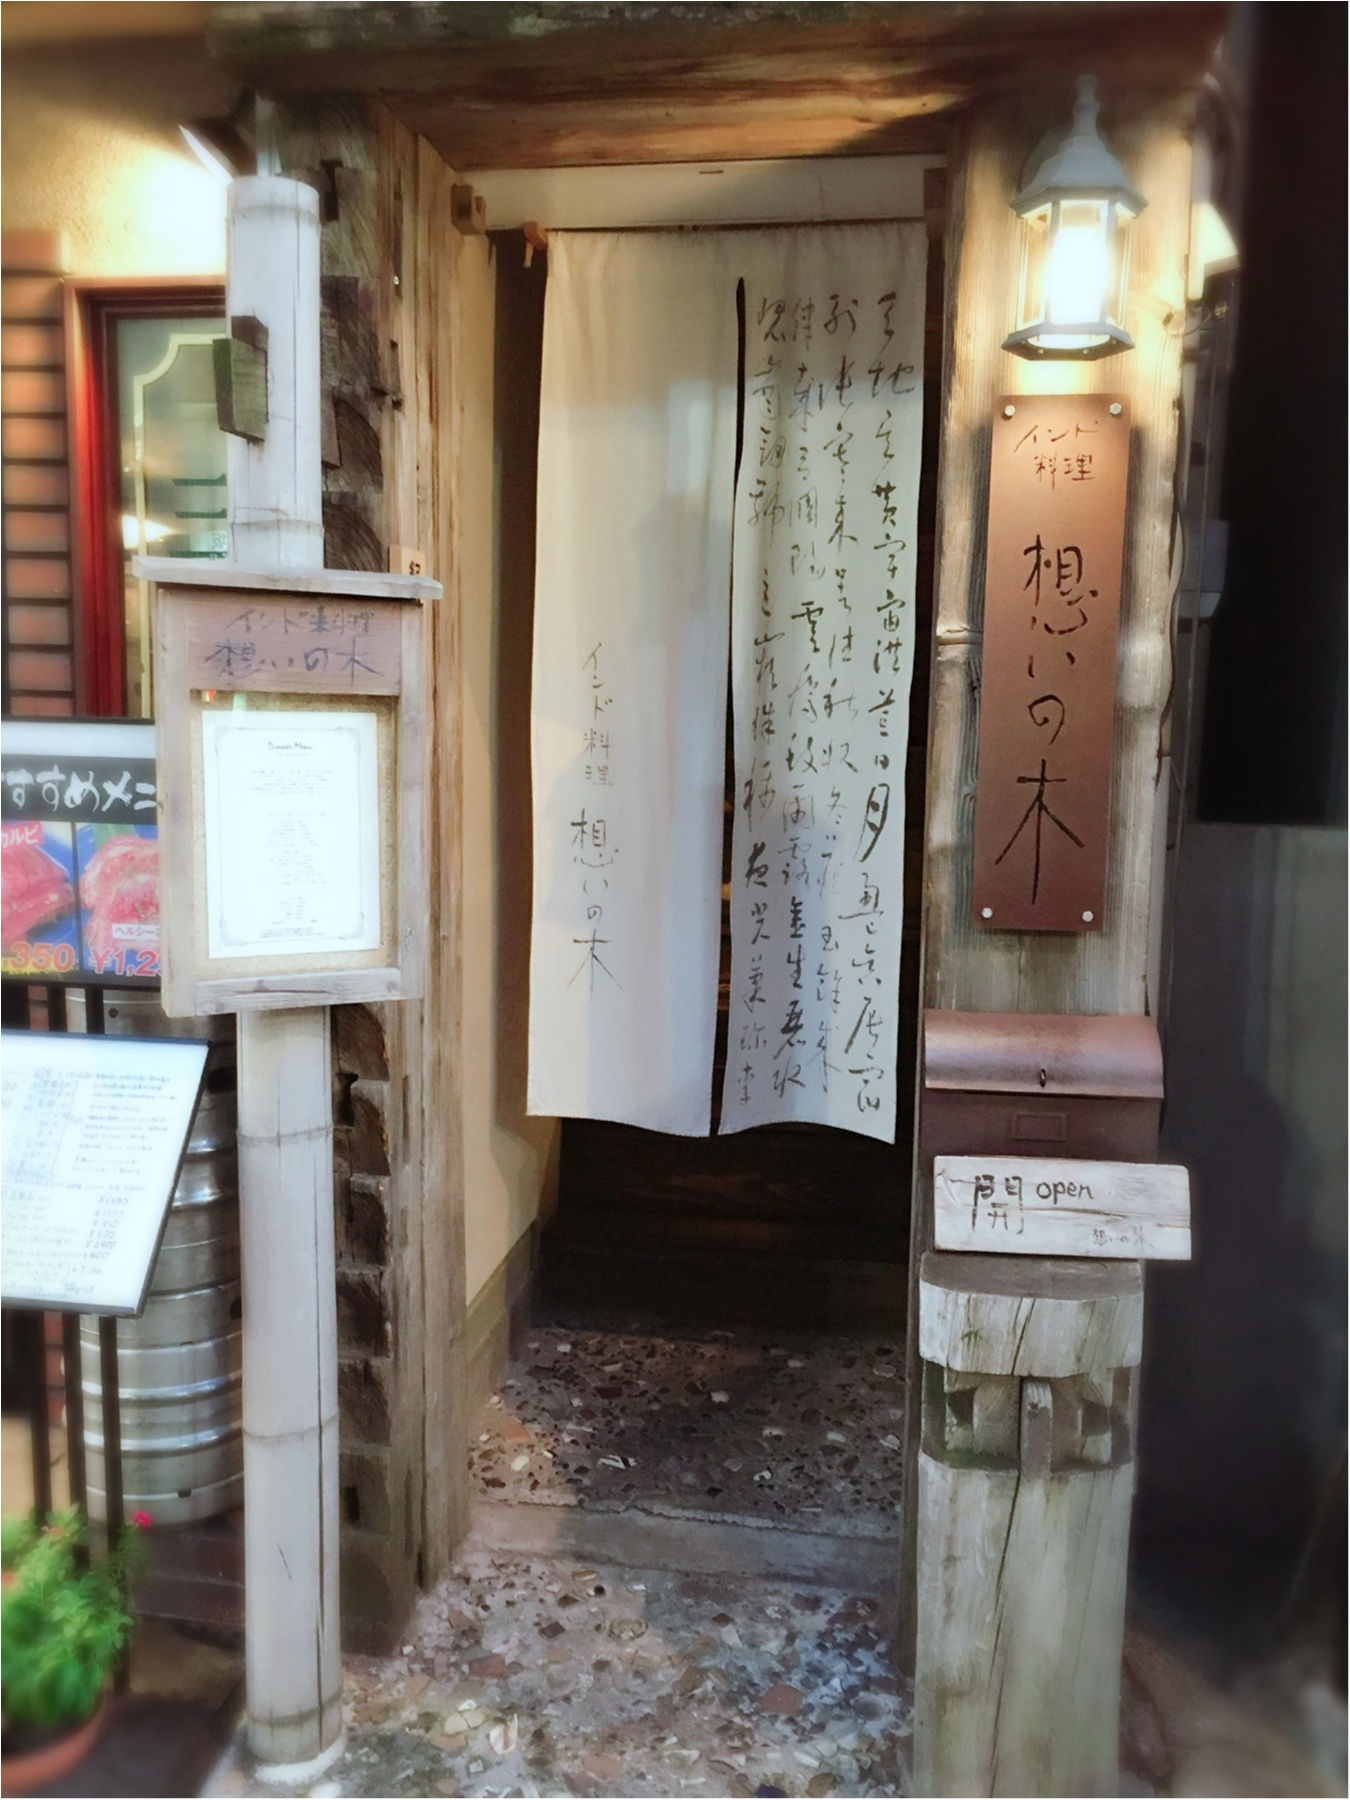 …ஐ 一見さん御断り…??!神楽坂の【想いの木】でスペシャルナイトディナー ஐ¨_5